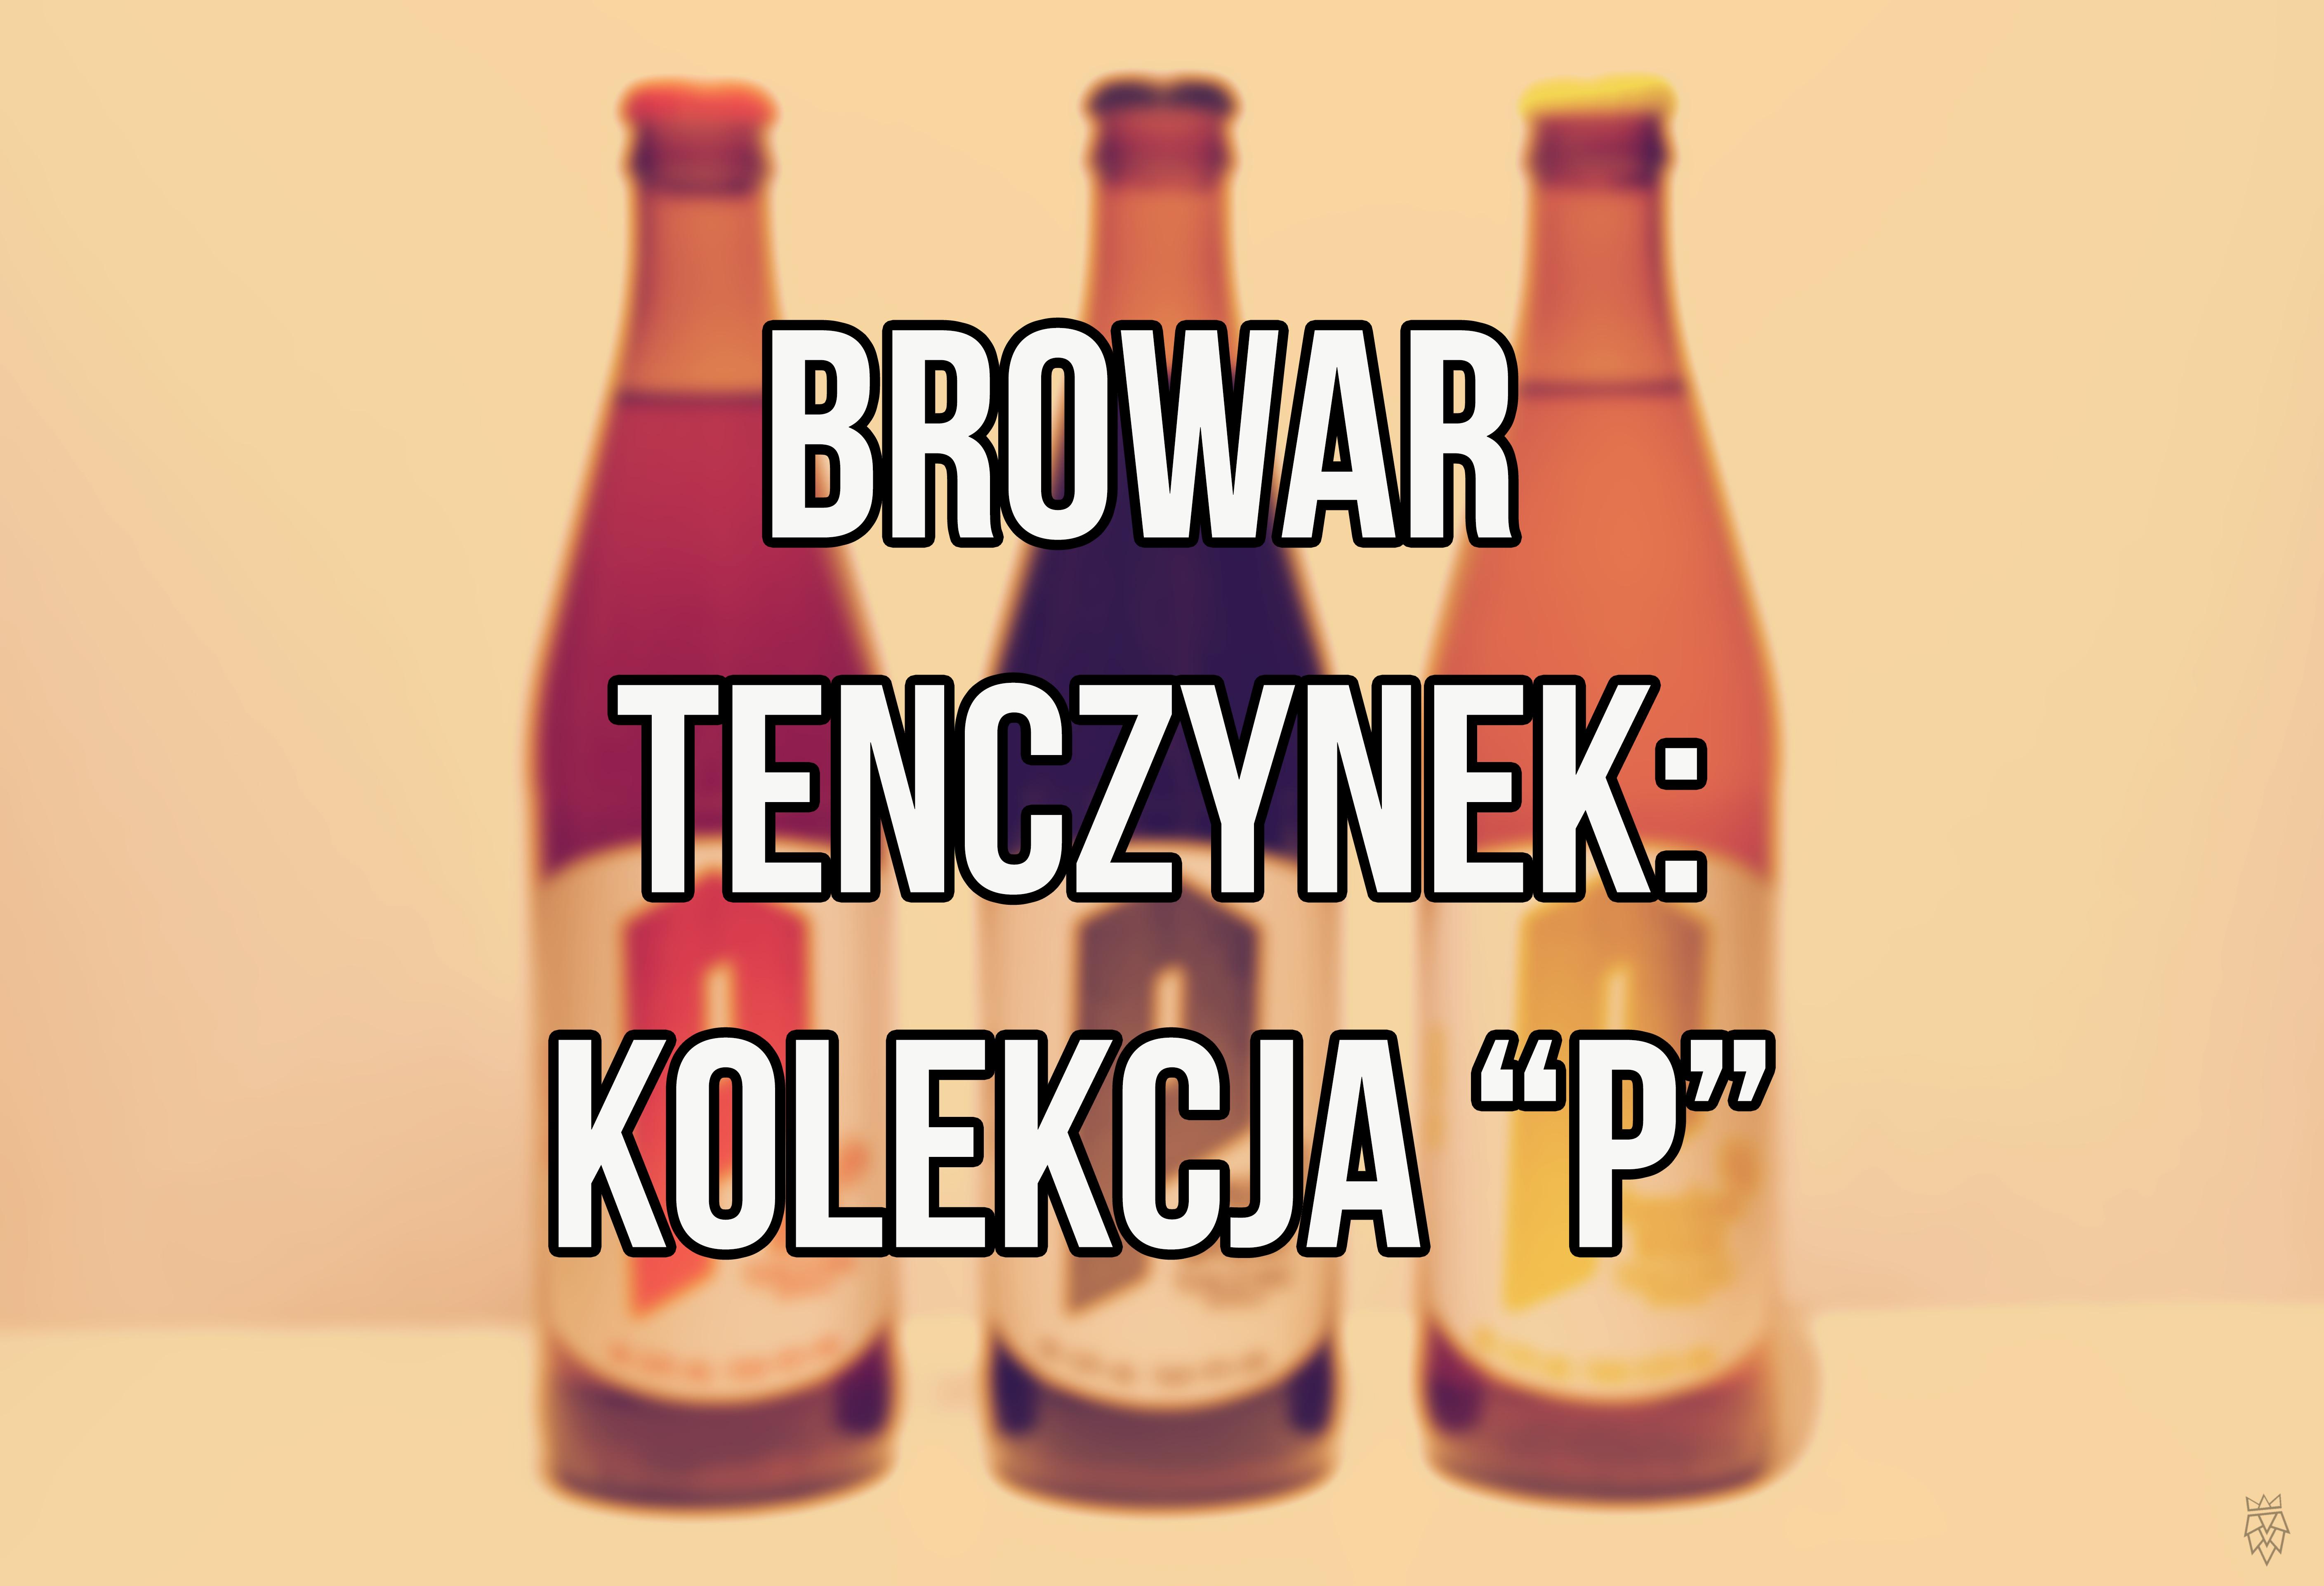 Tenczynek - kolekcja P